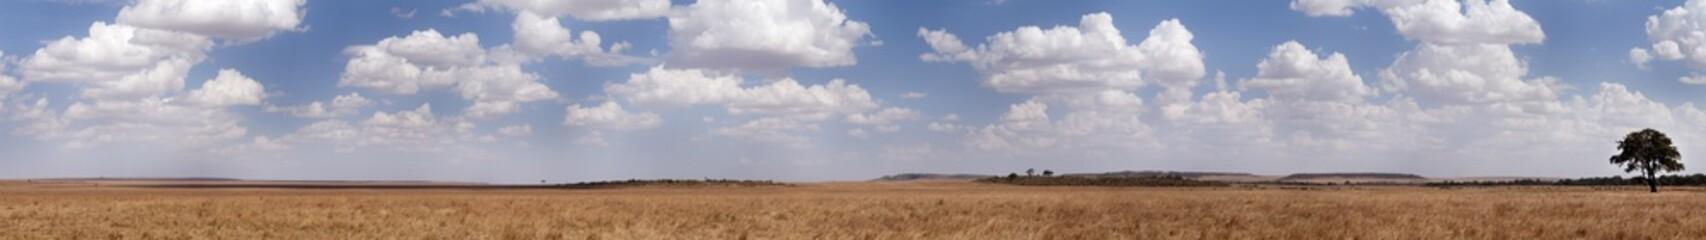 Wall Mural - A panoramic view of Masai Mara grassland, Kenya